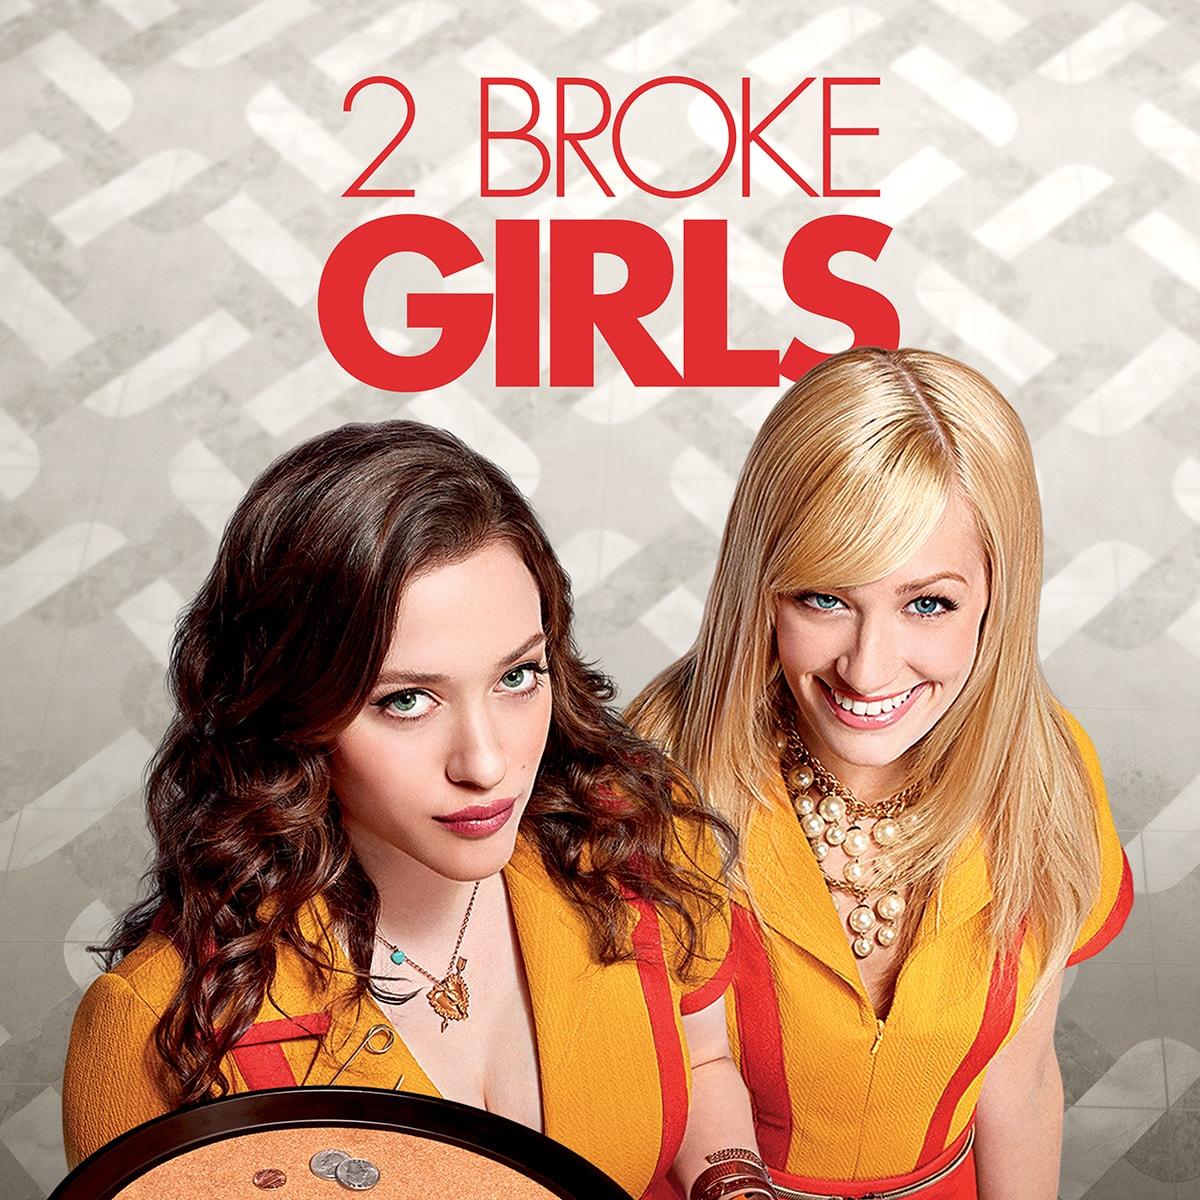 2 broke girls max dating los angeles lawyer